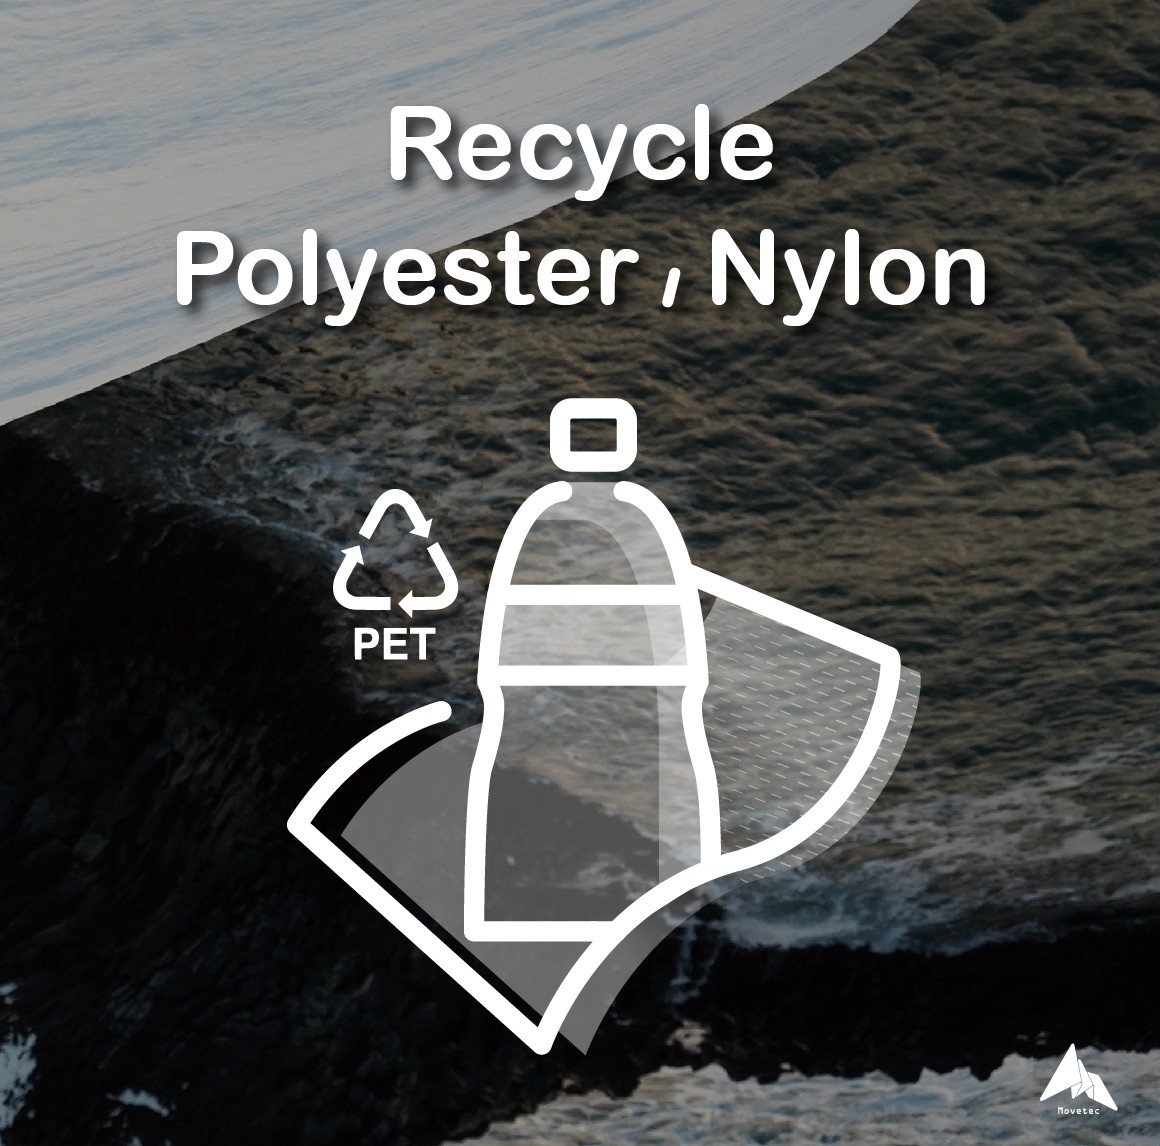 Recycle Polyester / Nylon